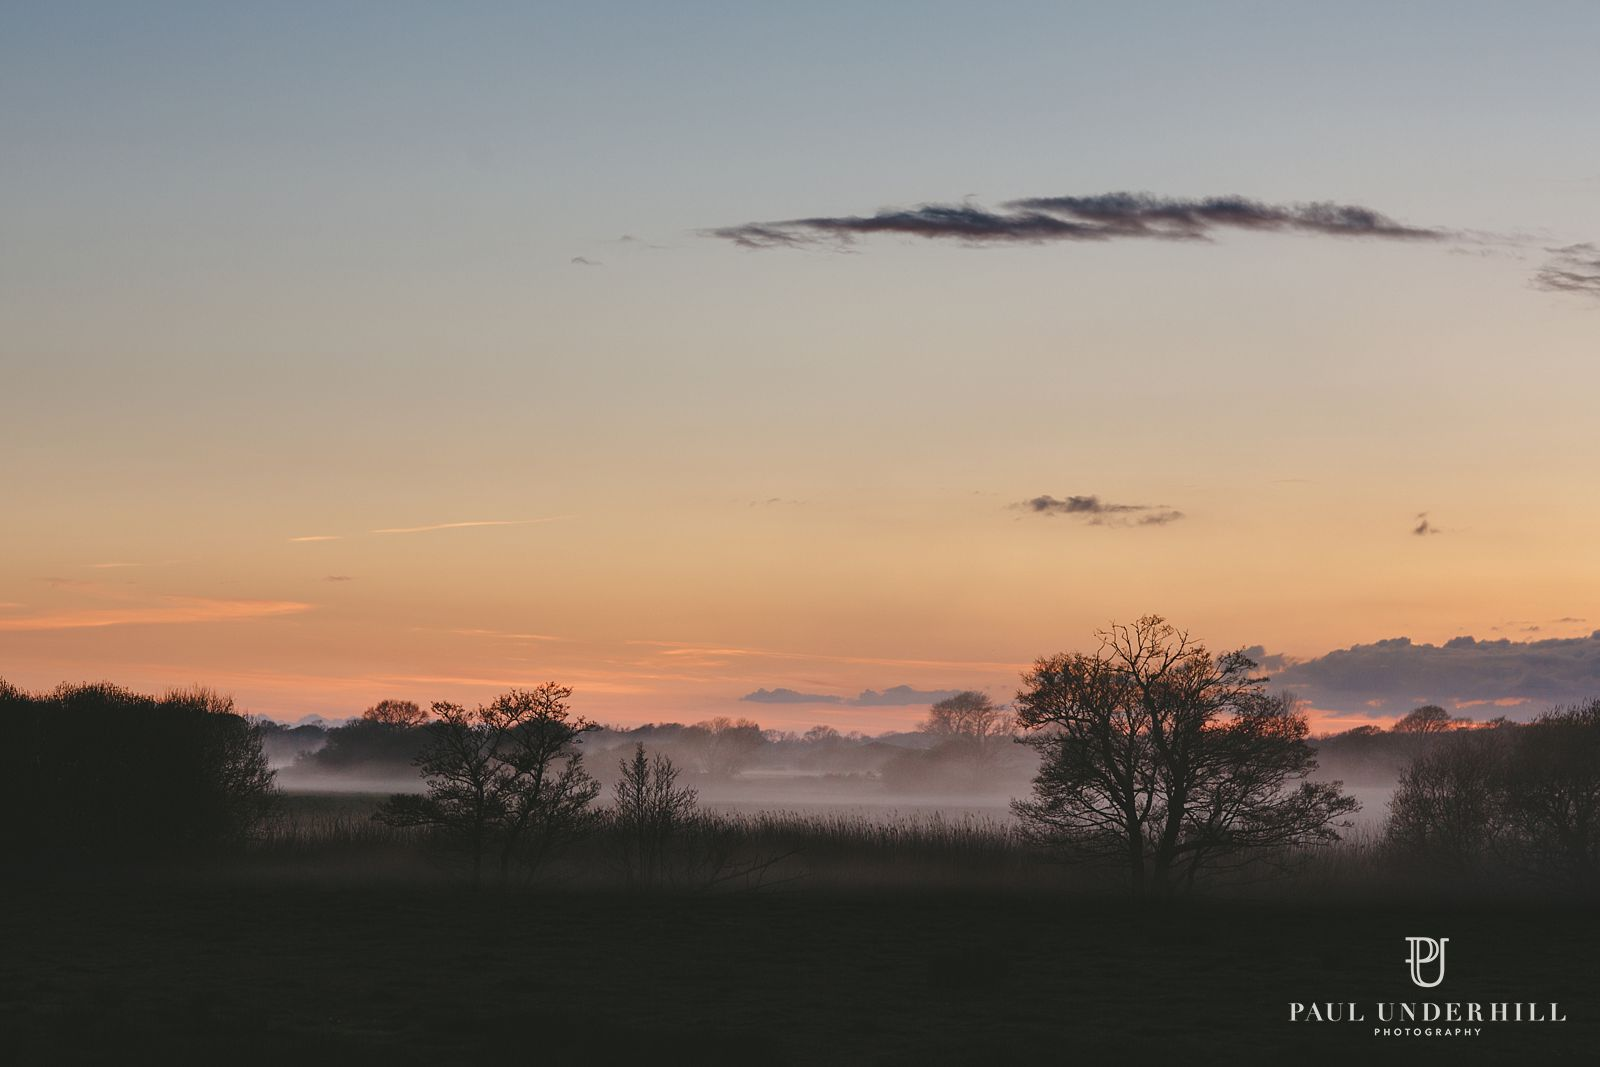 Sunset over Lulworth